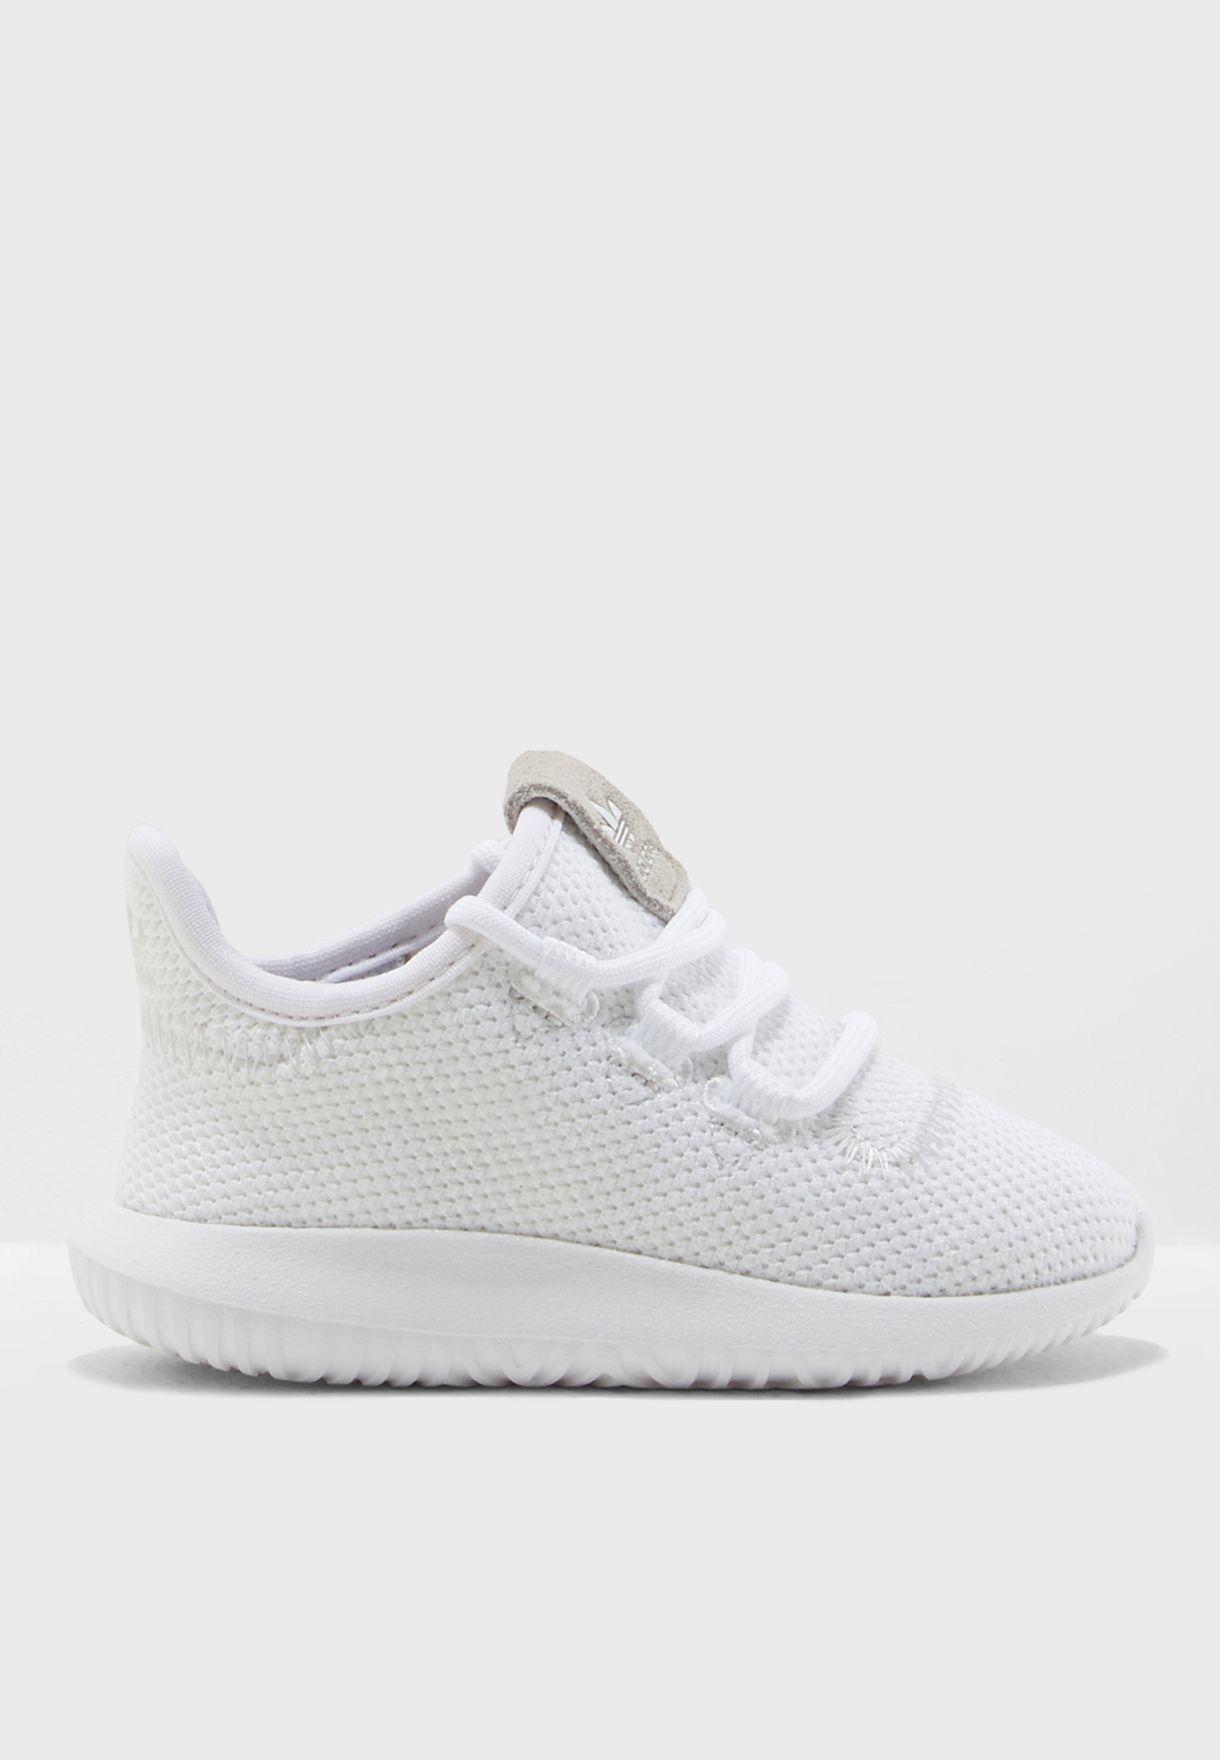 Adidas Tubular Shadow I Originals Todlers Shoes White//White cp9471